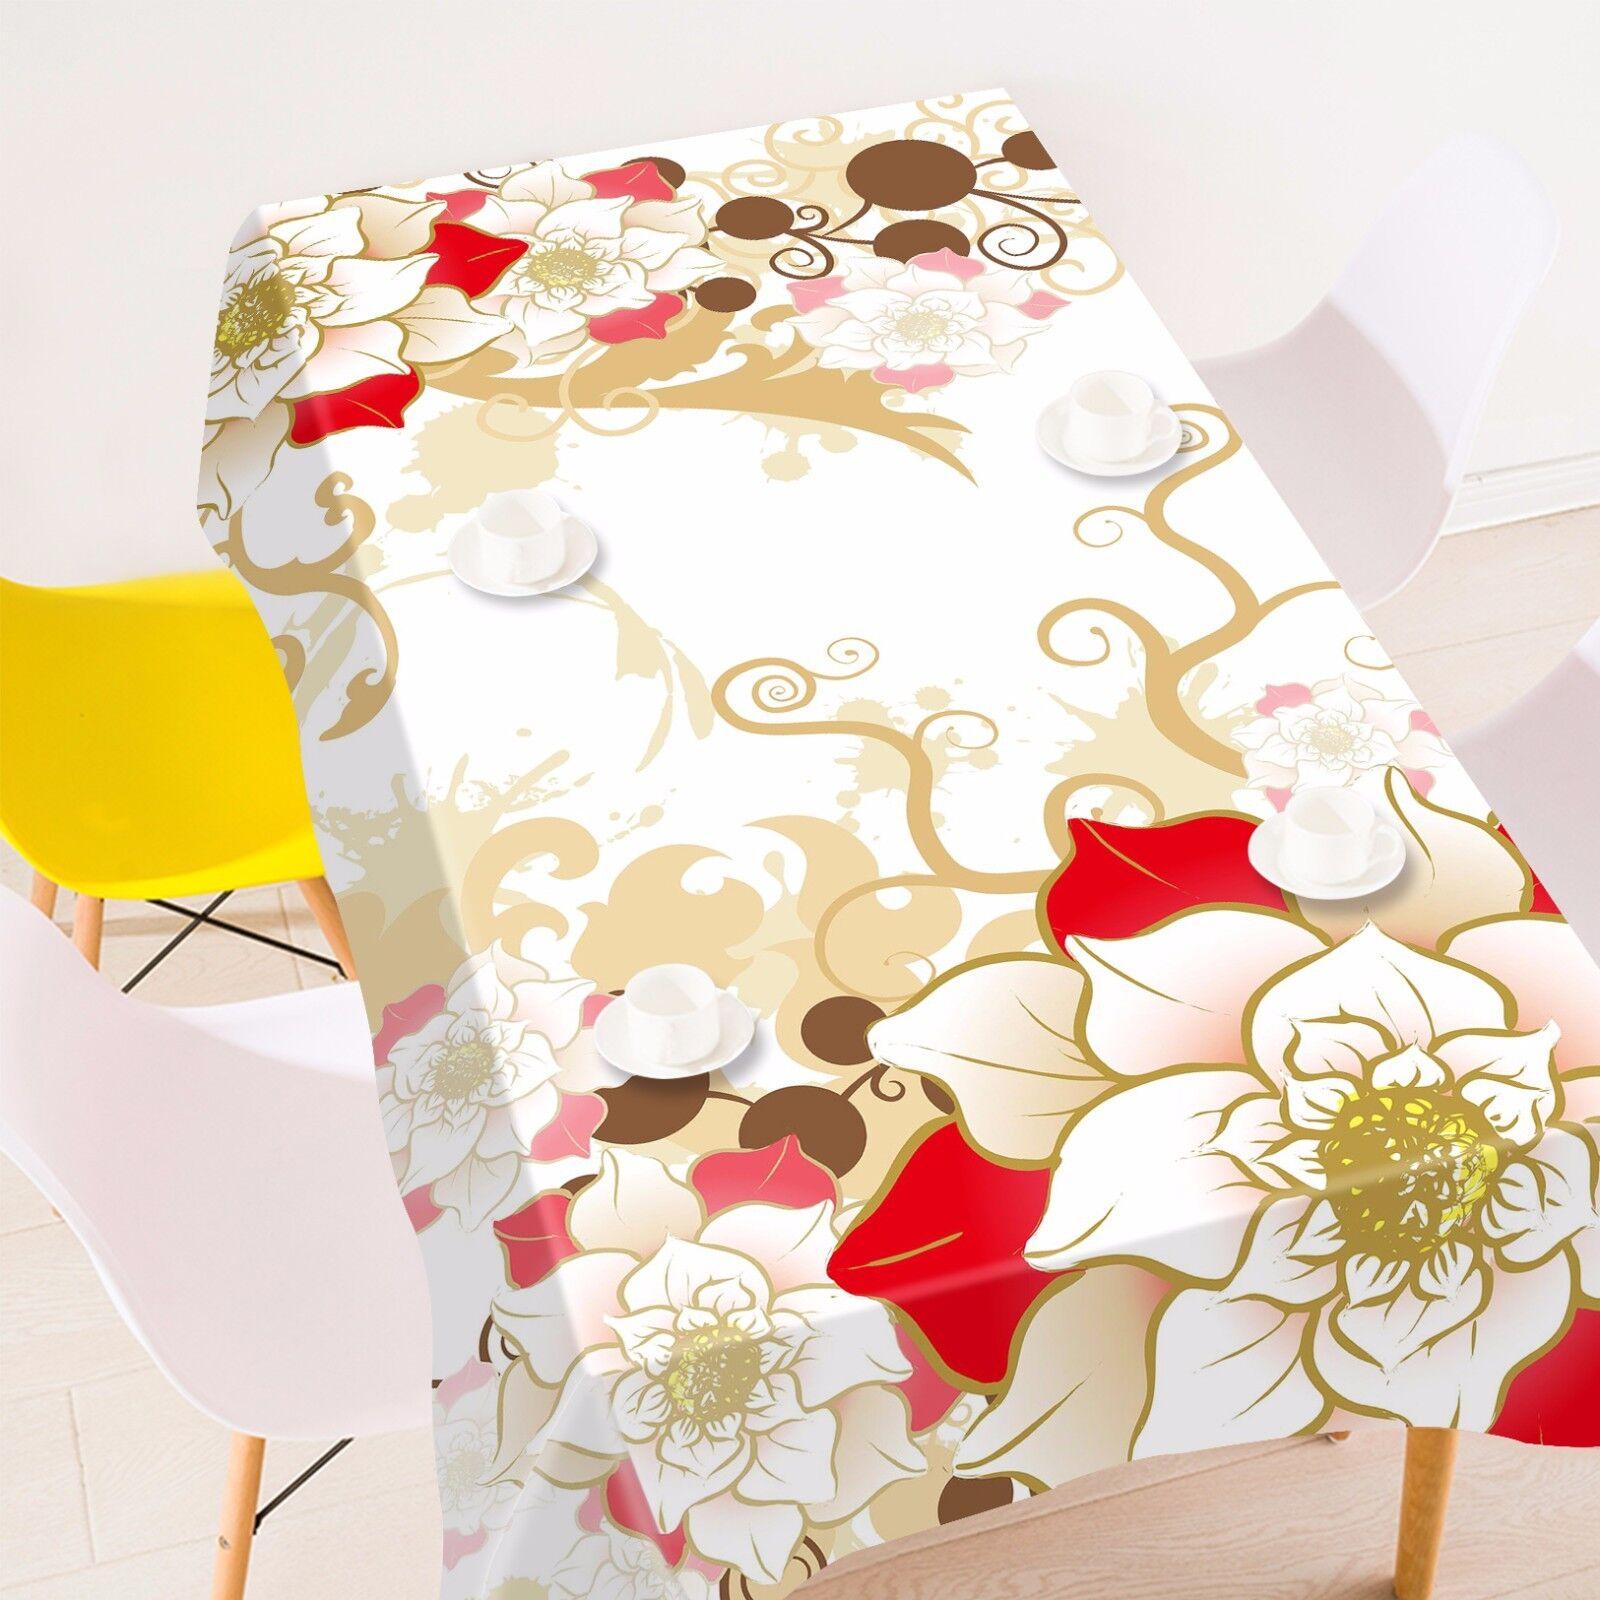 3D Cartoon 4 Tablecloth Table Cover Cloth Birthday Party Event AJ WALLPAPER AU